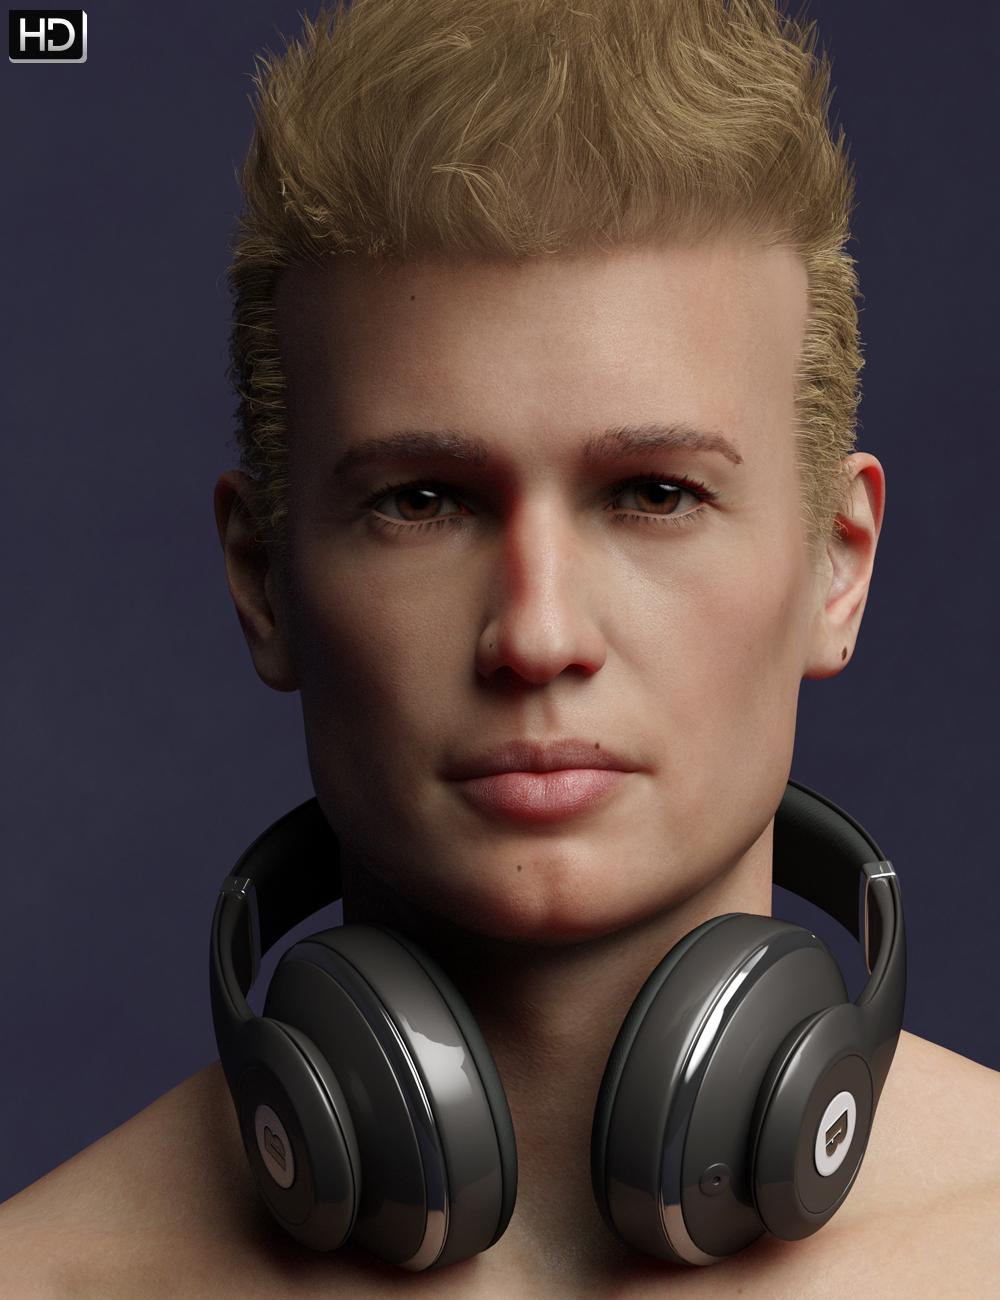 Bruno HD for Michael 8 by: Emrys, 3D Models by Daz 3D